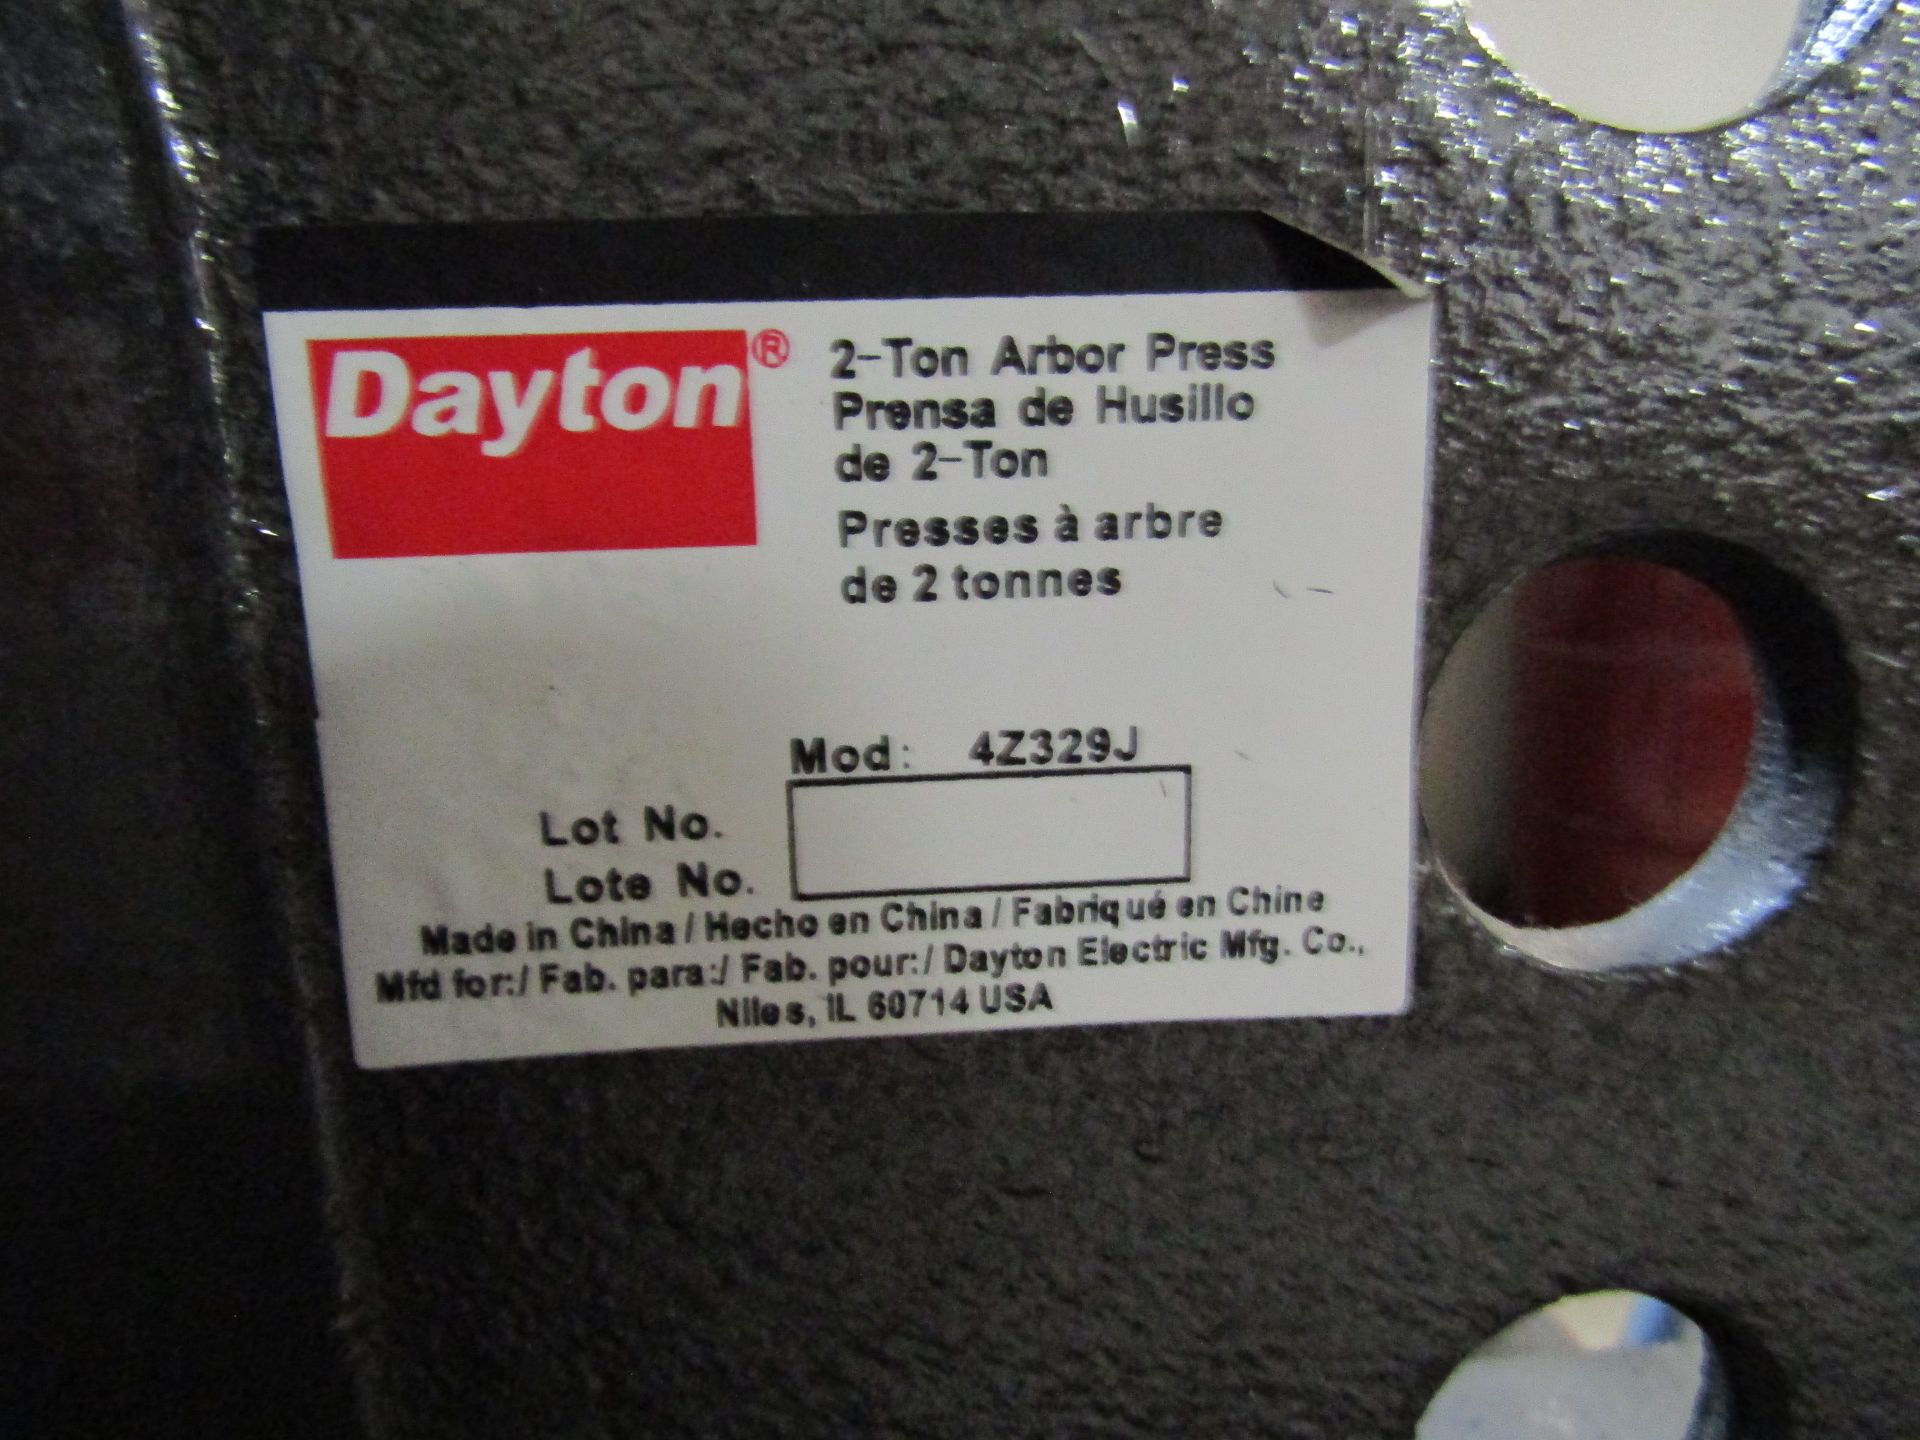 Lot 52 - DAYTON 2-Ton Arbor Press Model 4Z329J